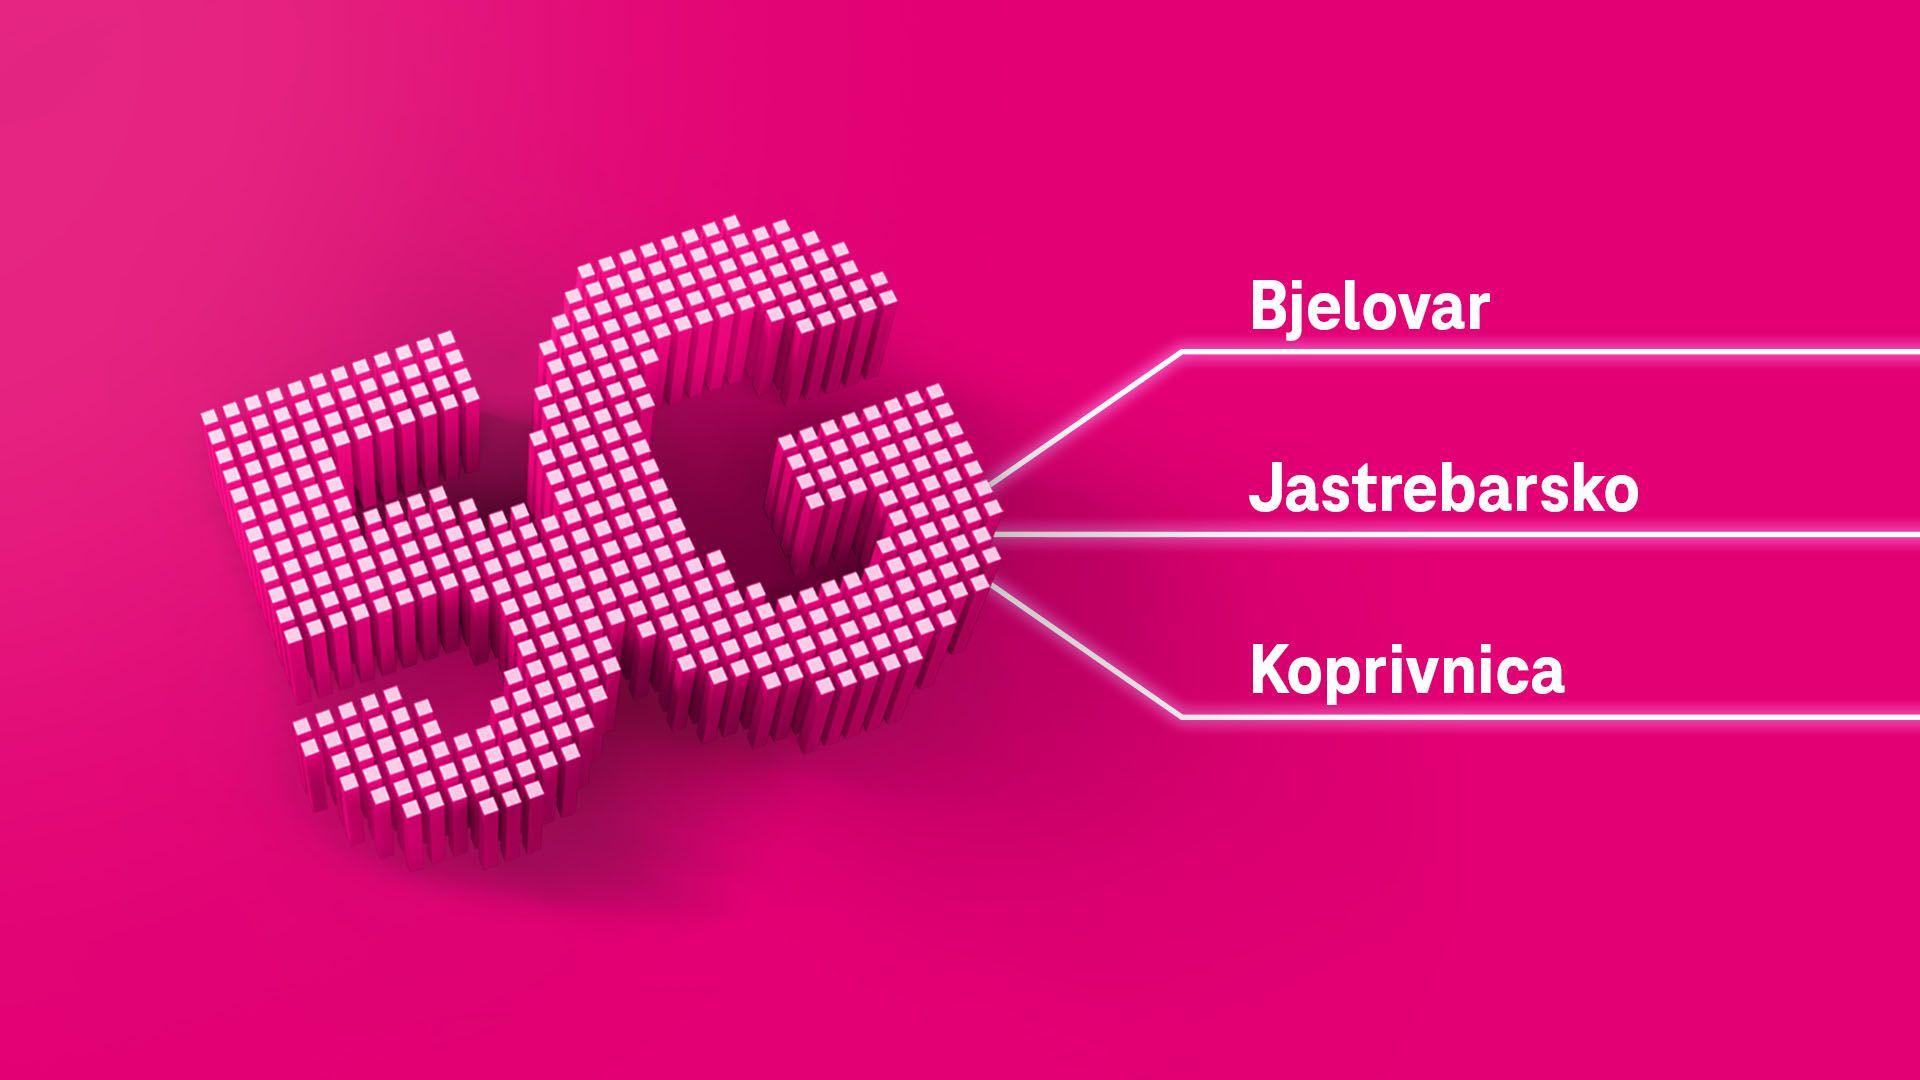 5G mreža bjelovar